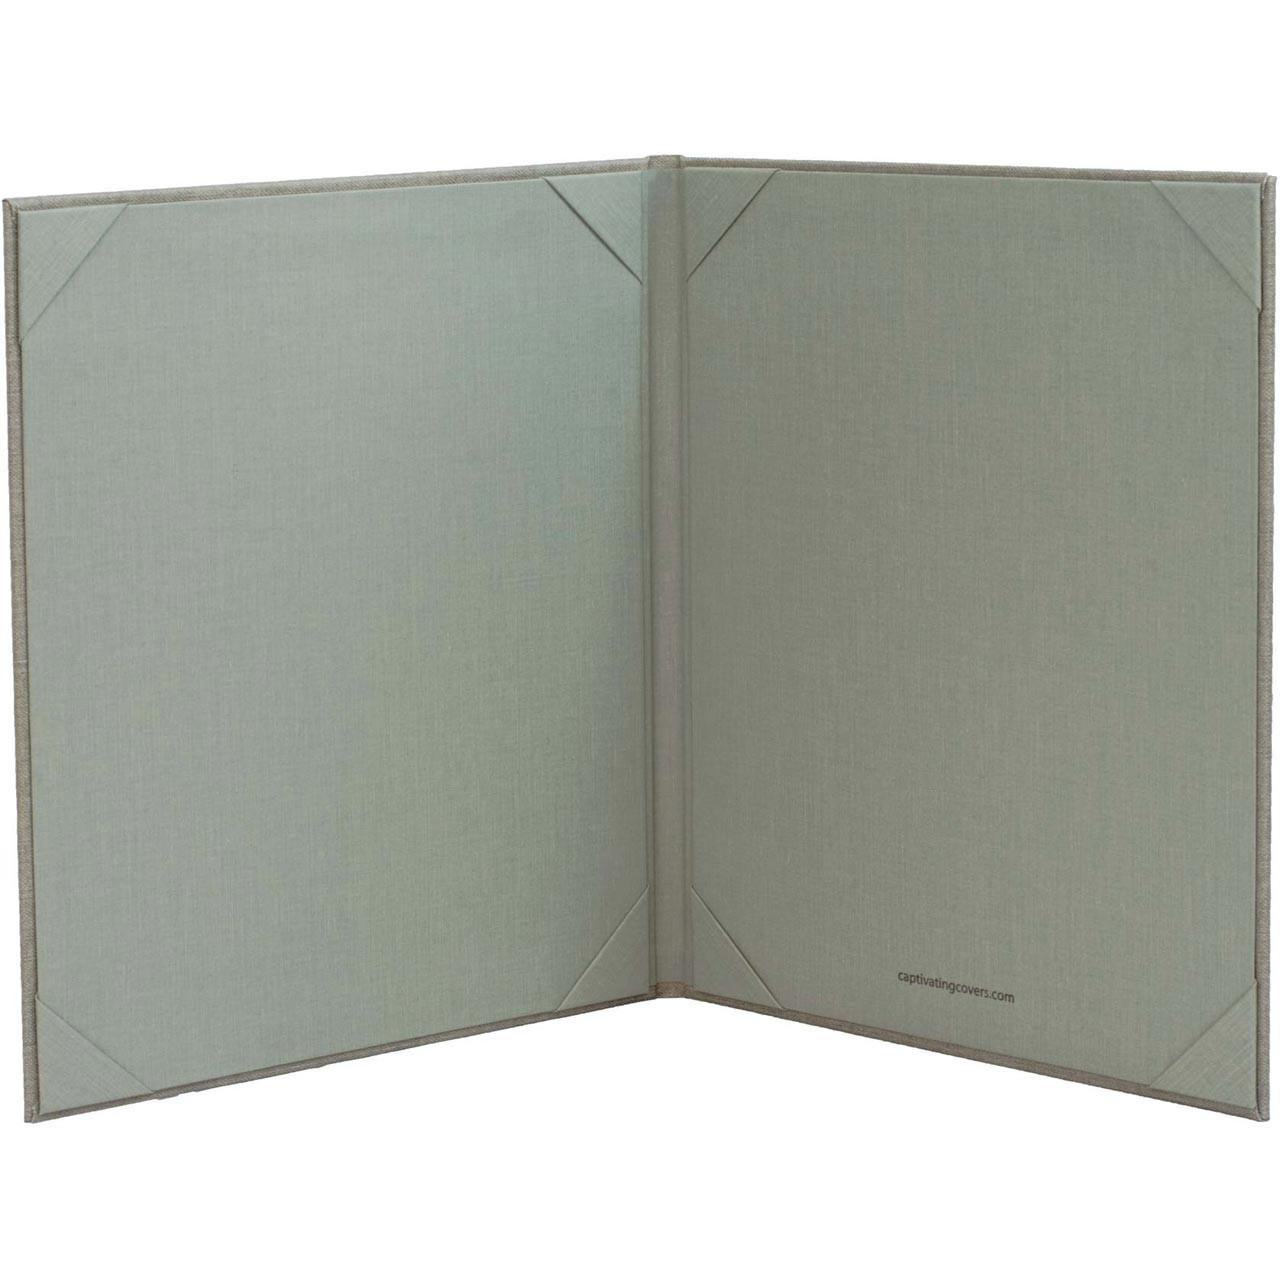 8.5 x 11 Insert, 2-Panel Menu Cover (Gray - inside)